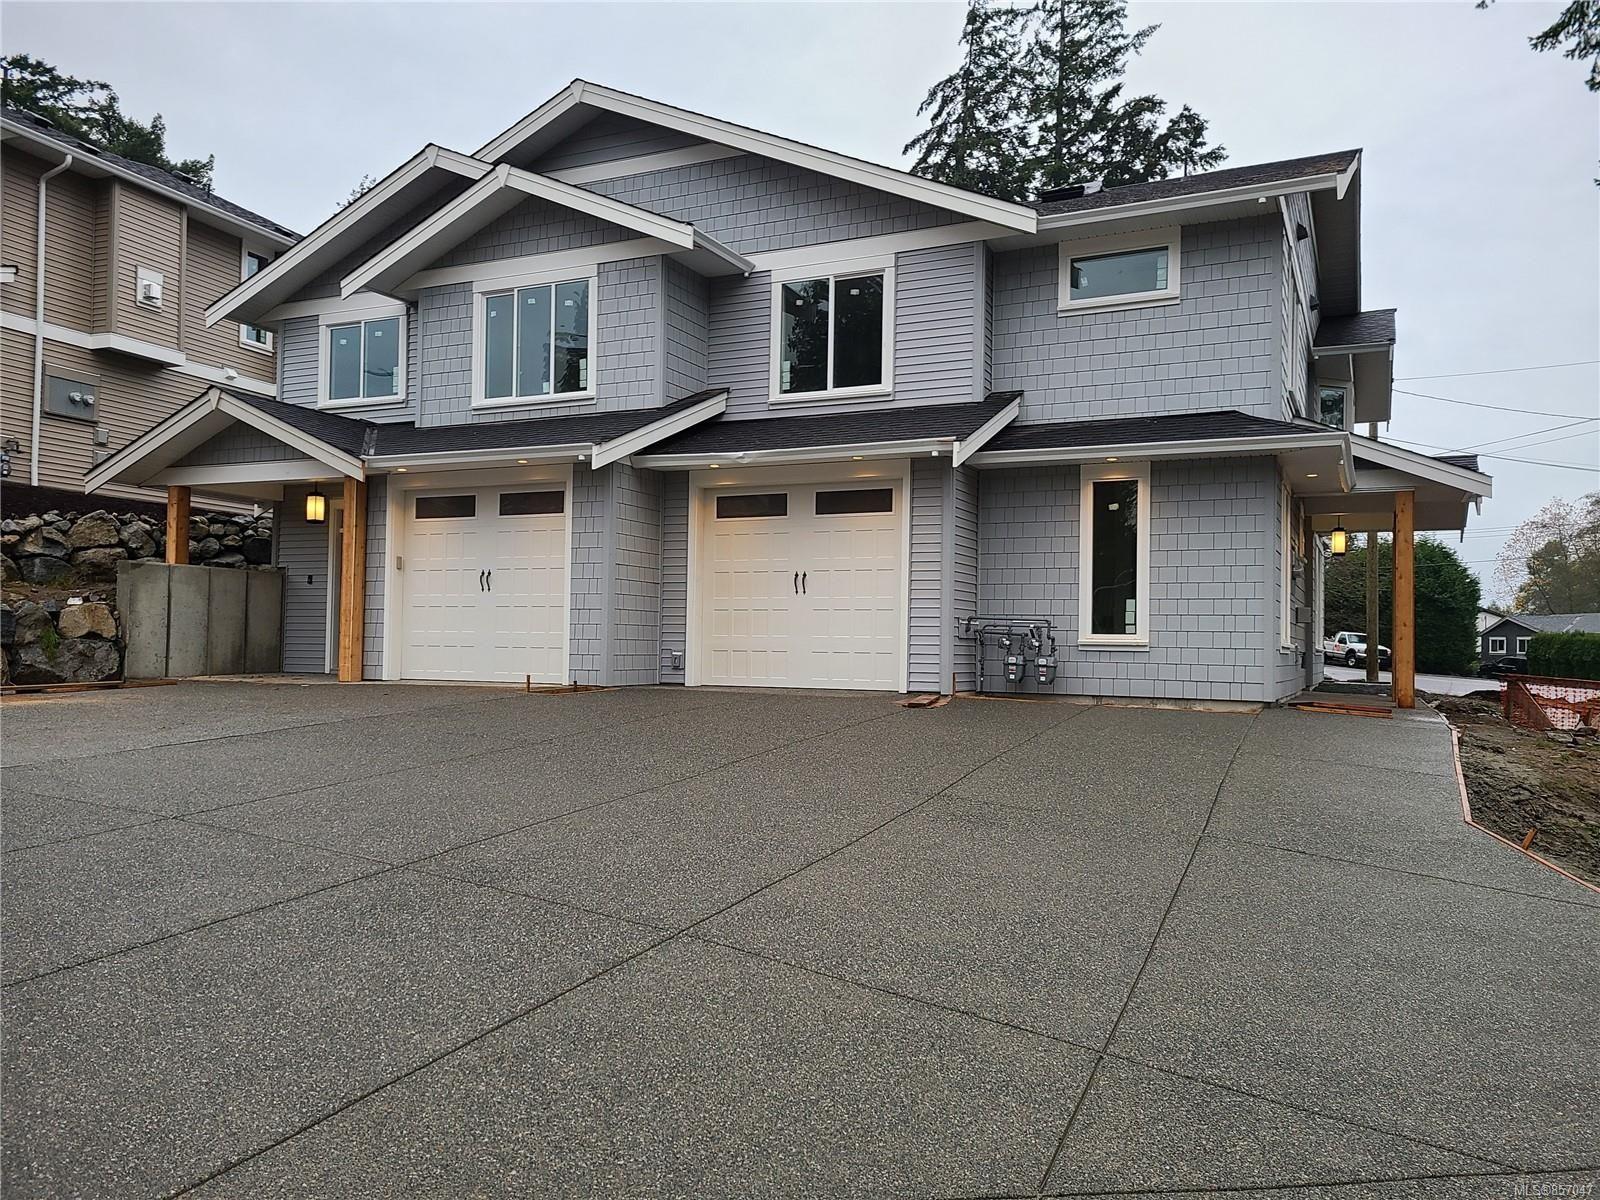 Main Photo: 102 Golden Oaks Cres in : Na North Nanaimo Half Duplex for sale (Nanaimo)  : MLS®# 857047